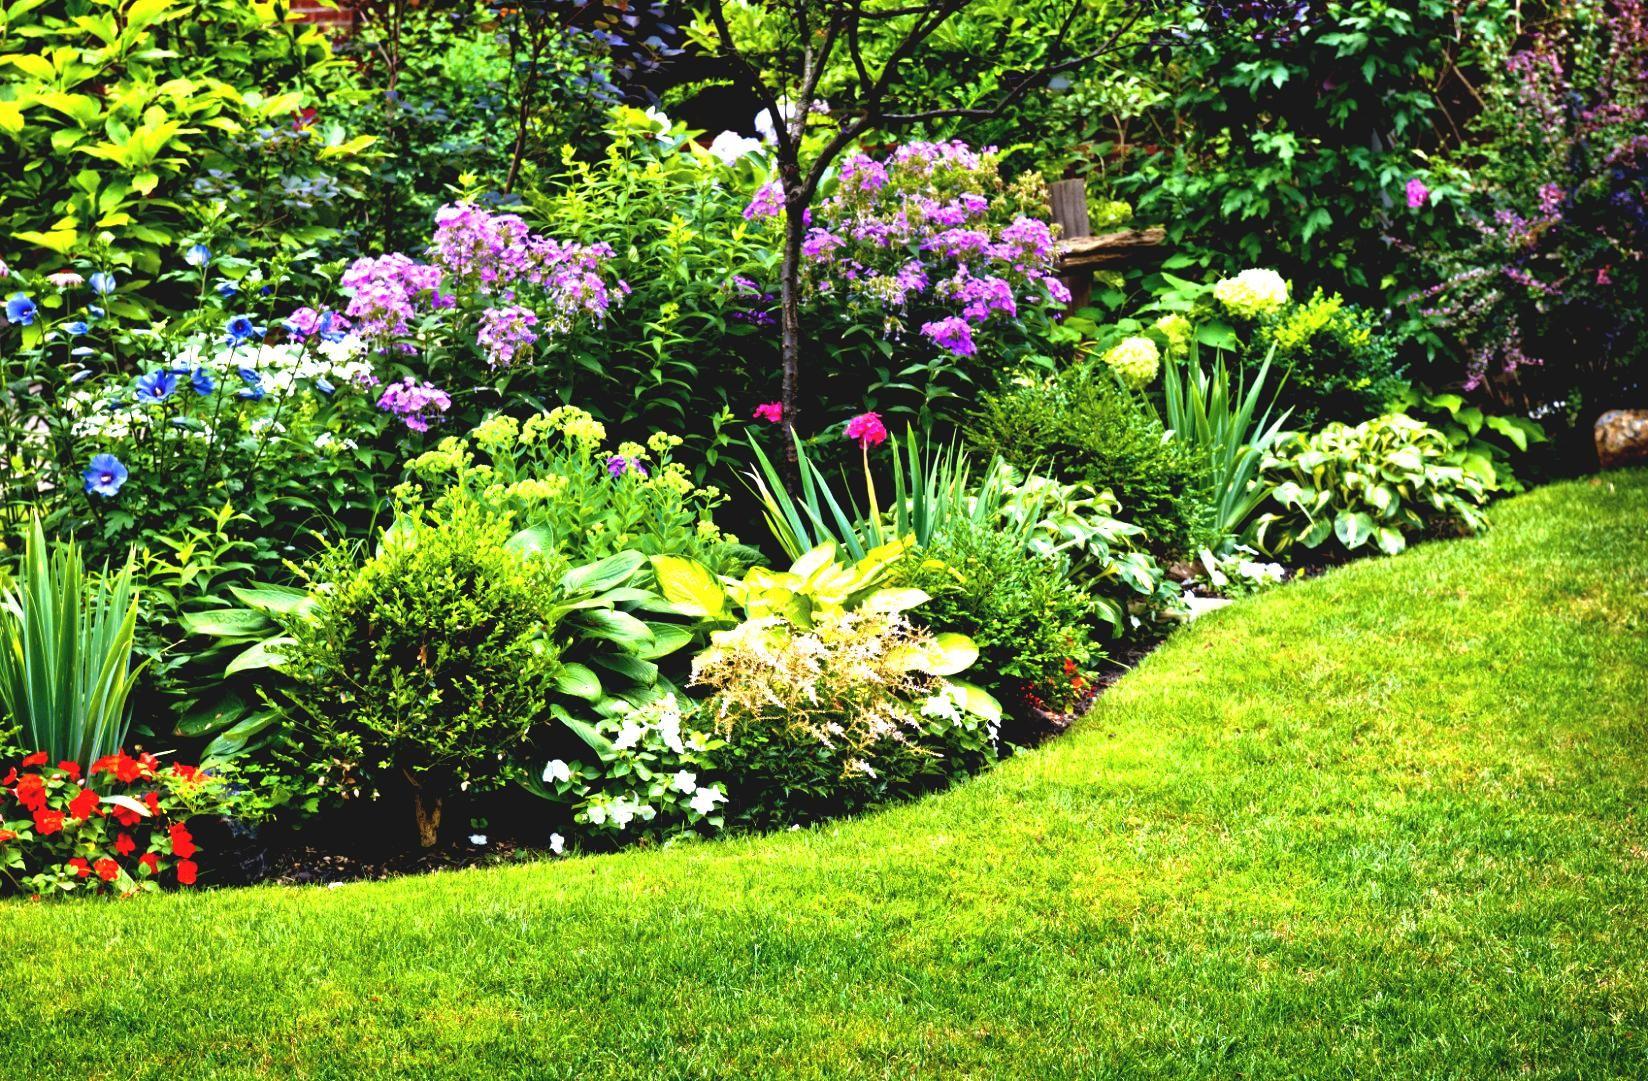 Land Scape Low Growing Perennial Flowers Pin Garden Garden Design